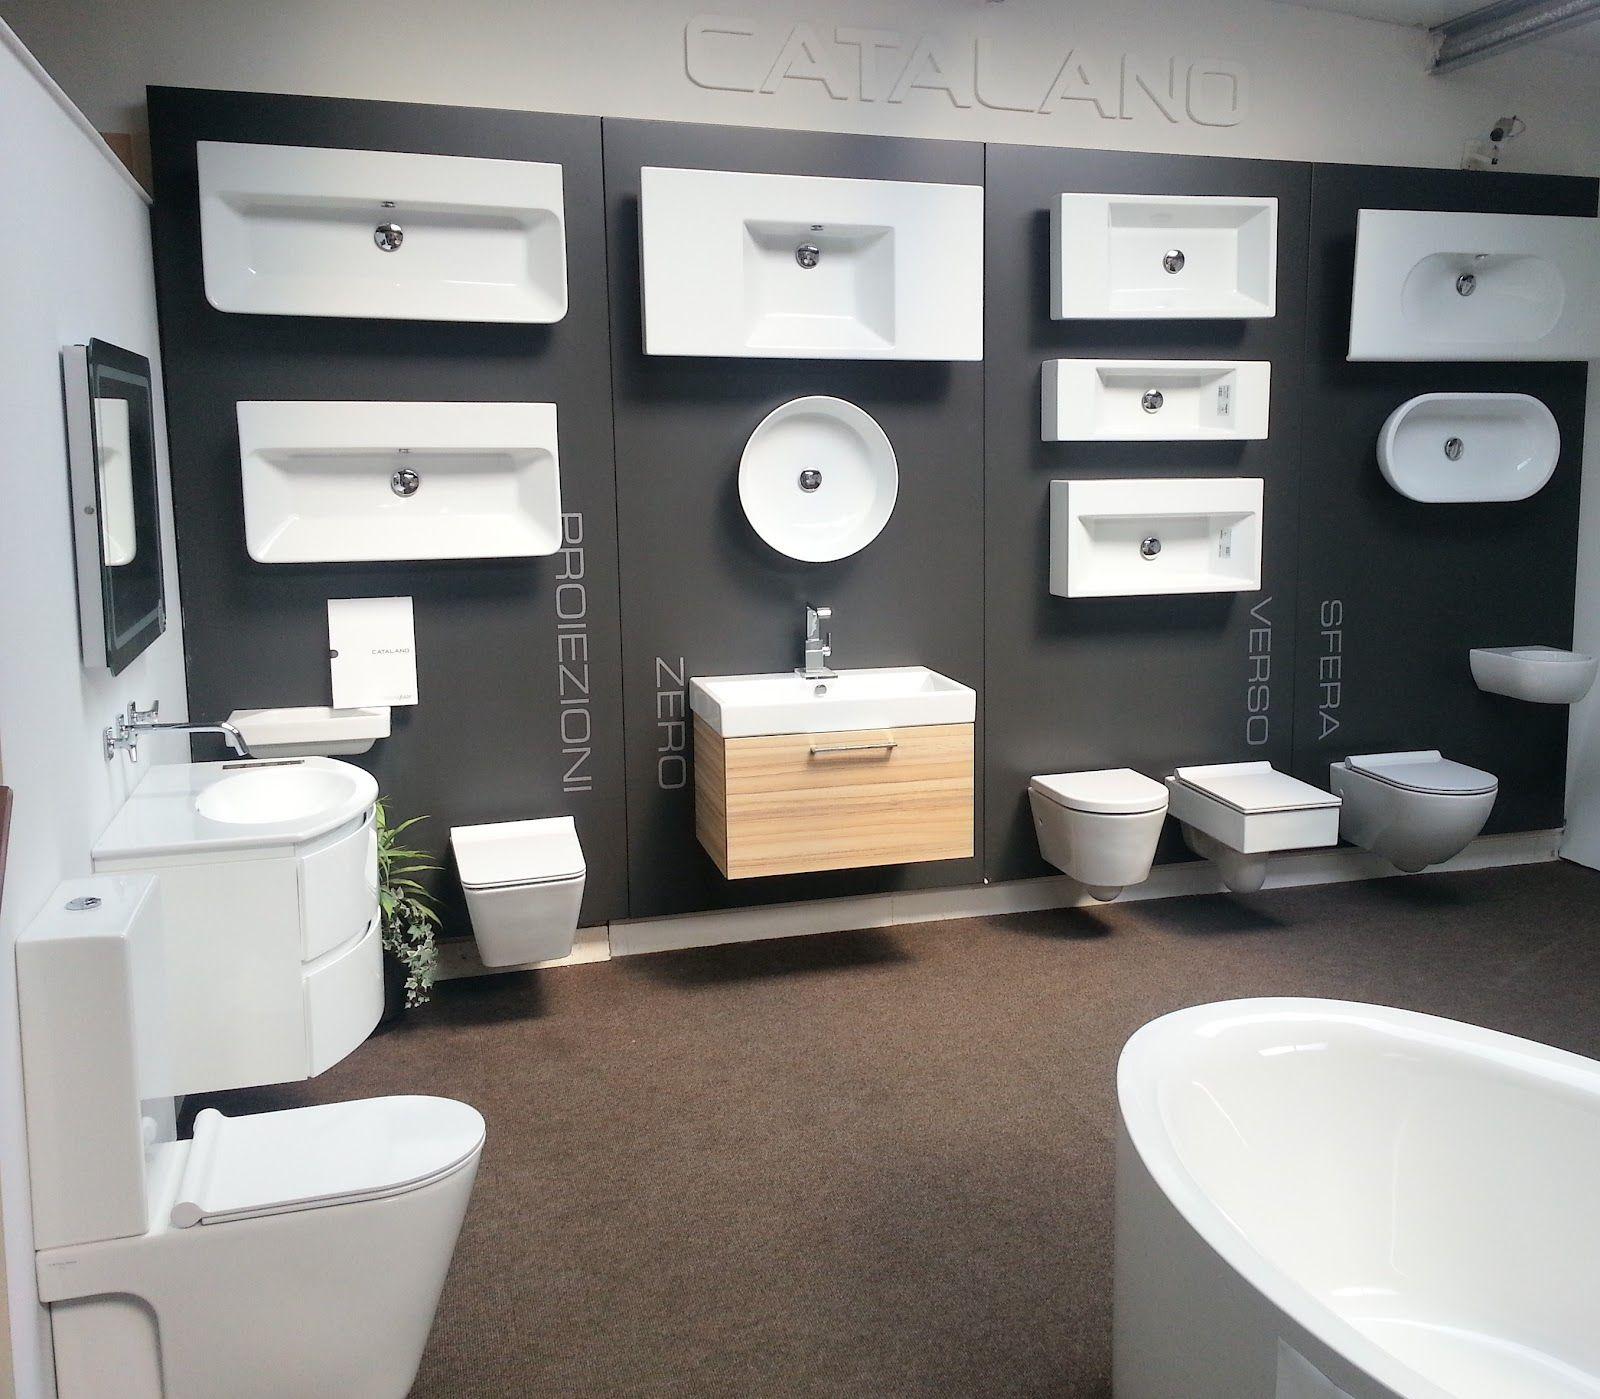 Plumbing Showroom Design Google Search Bathroom Showrooms Showroom Interior Design Showroom Decor